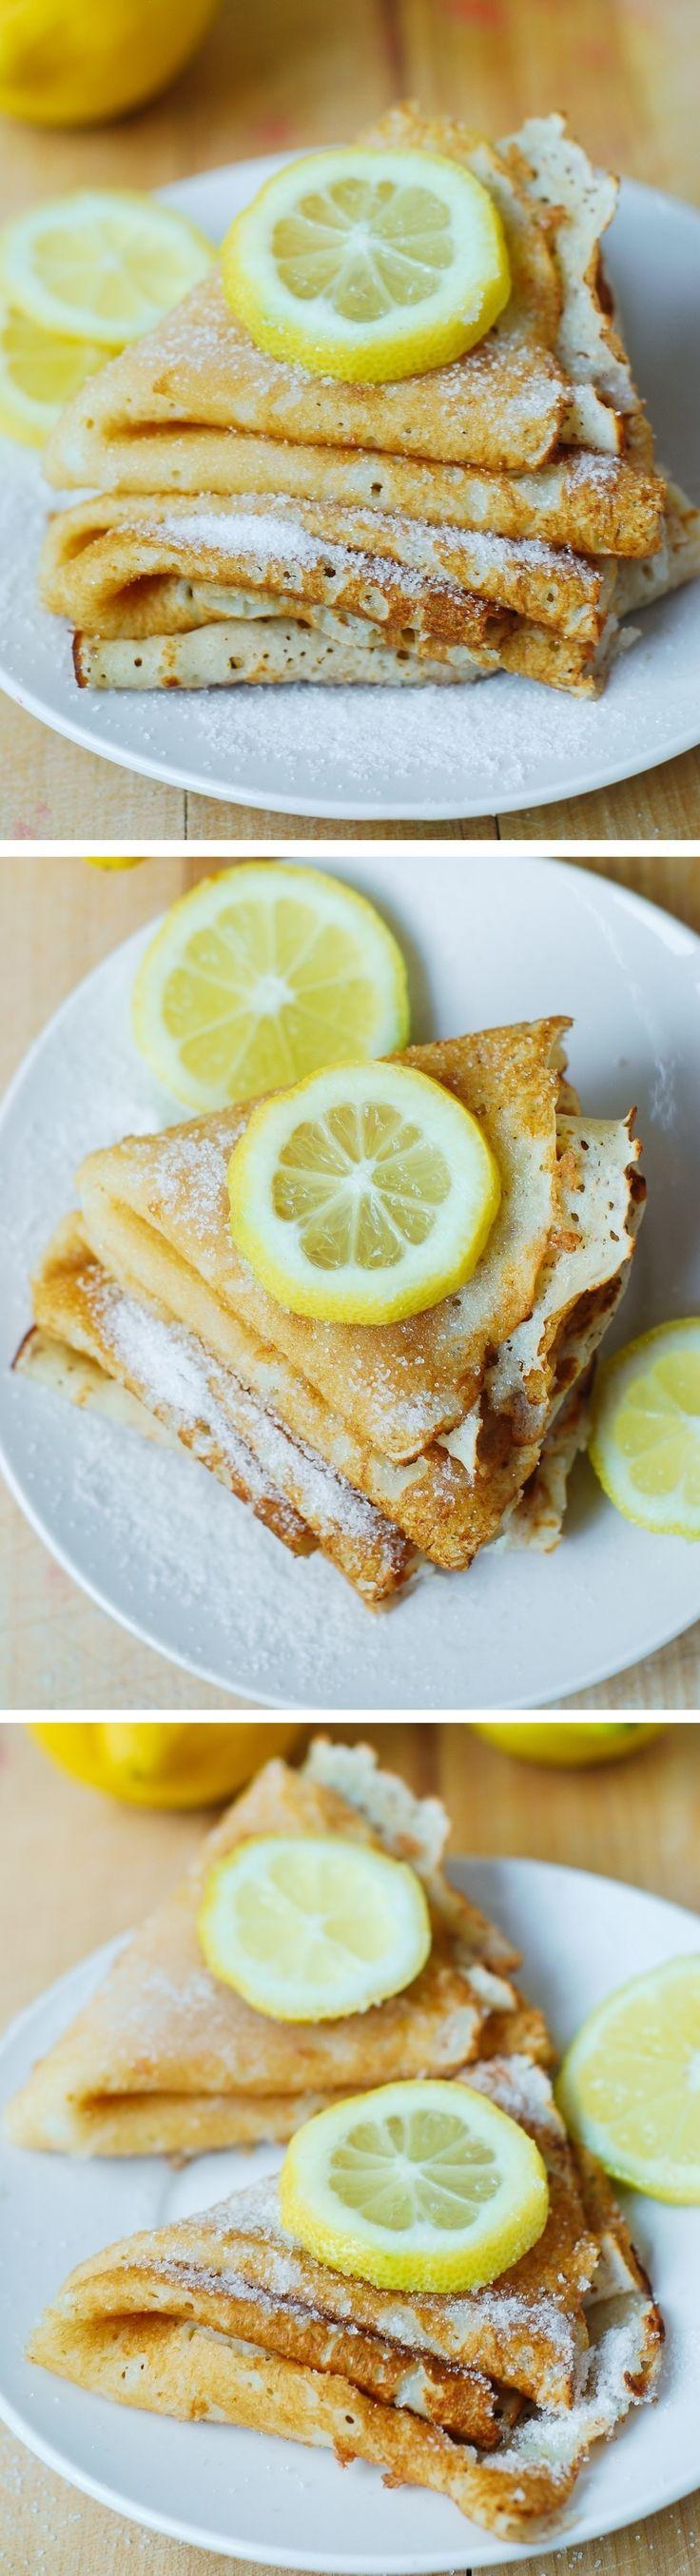 Lemon Sugar Dessert Crepes